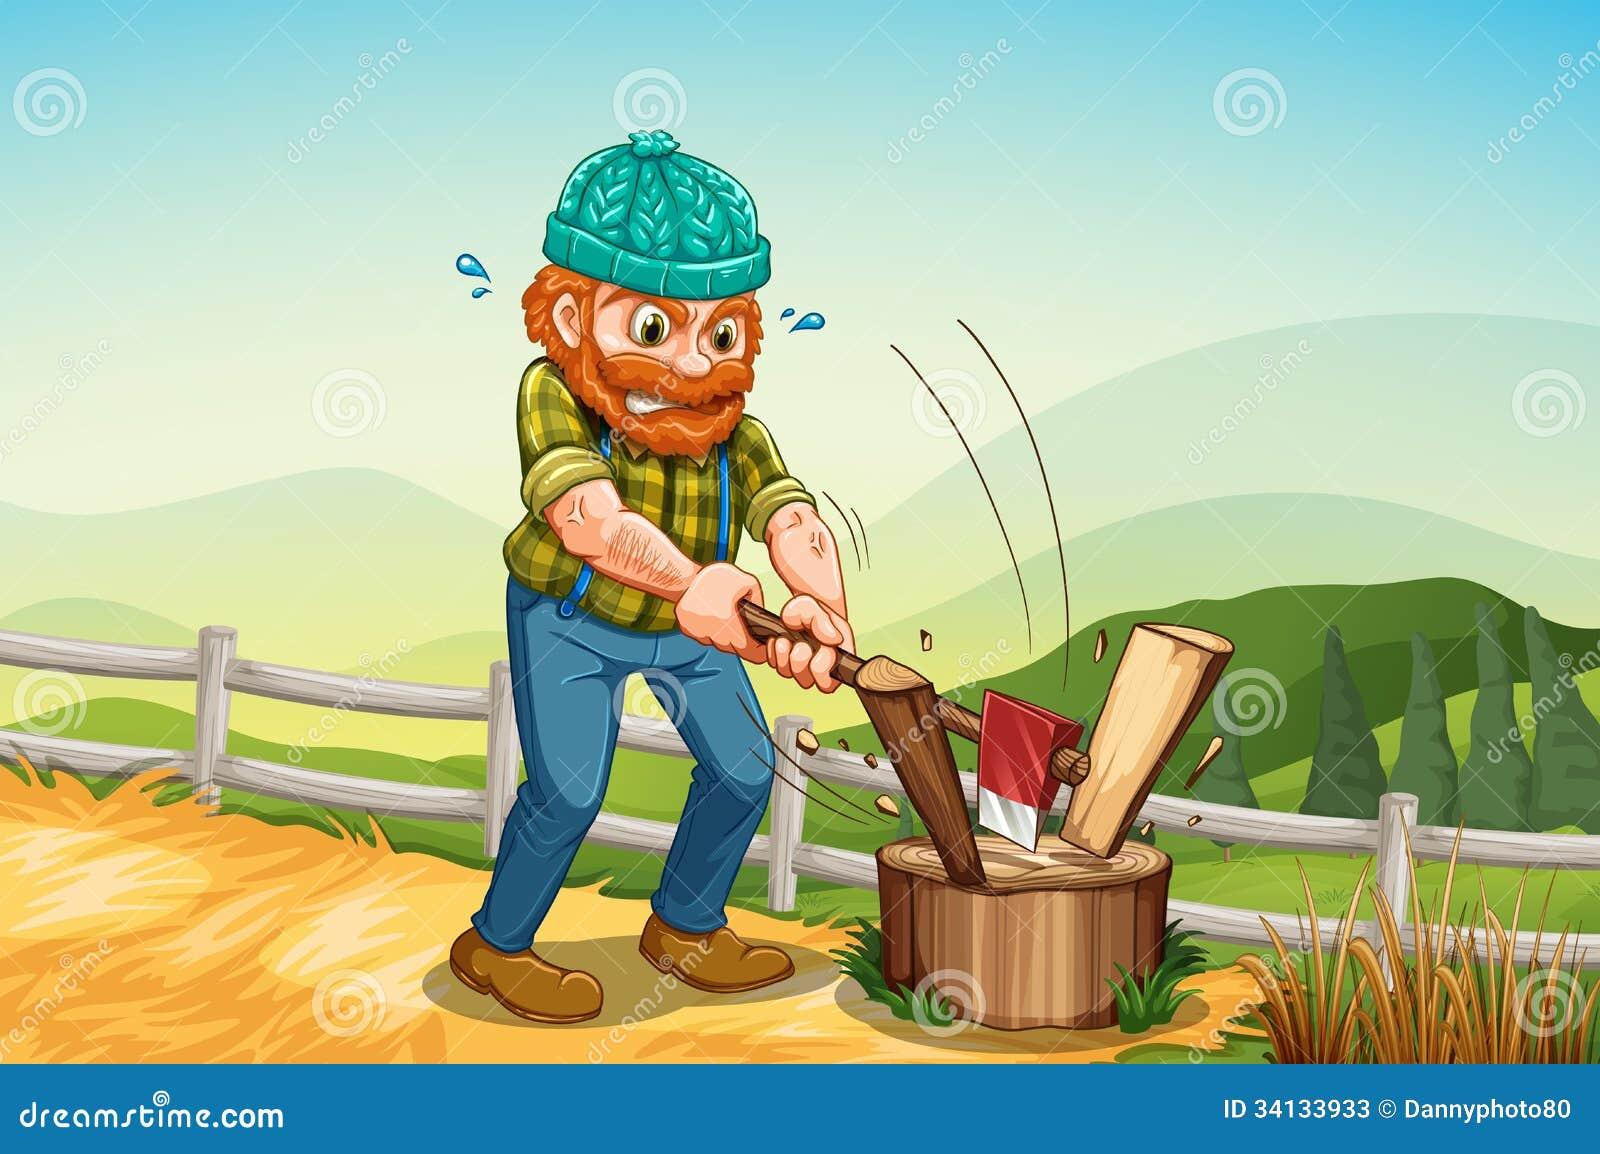 A Man Chopping The Log Above The Stump Stock Photos